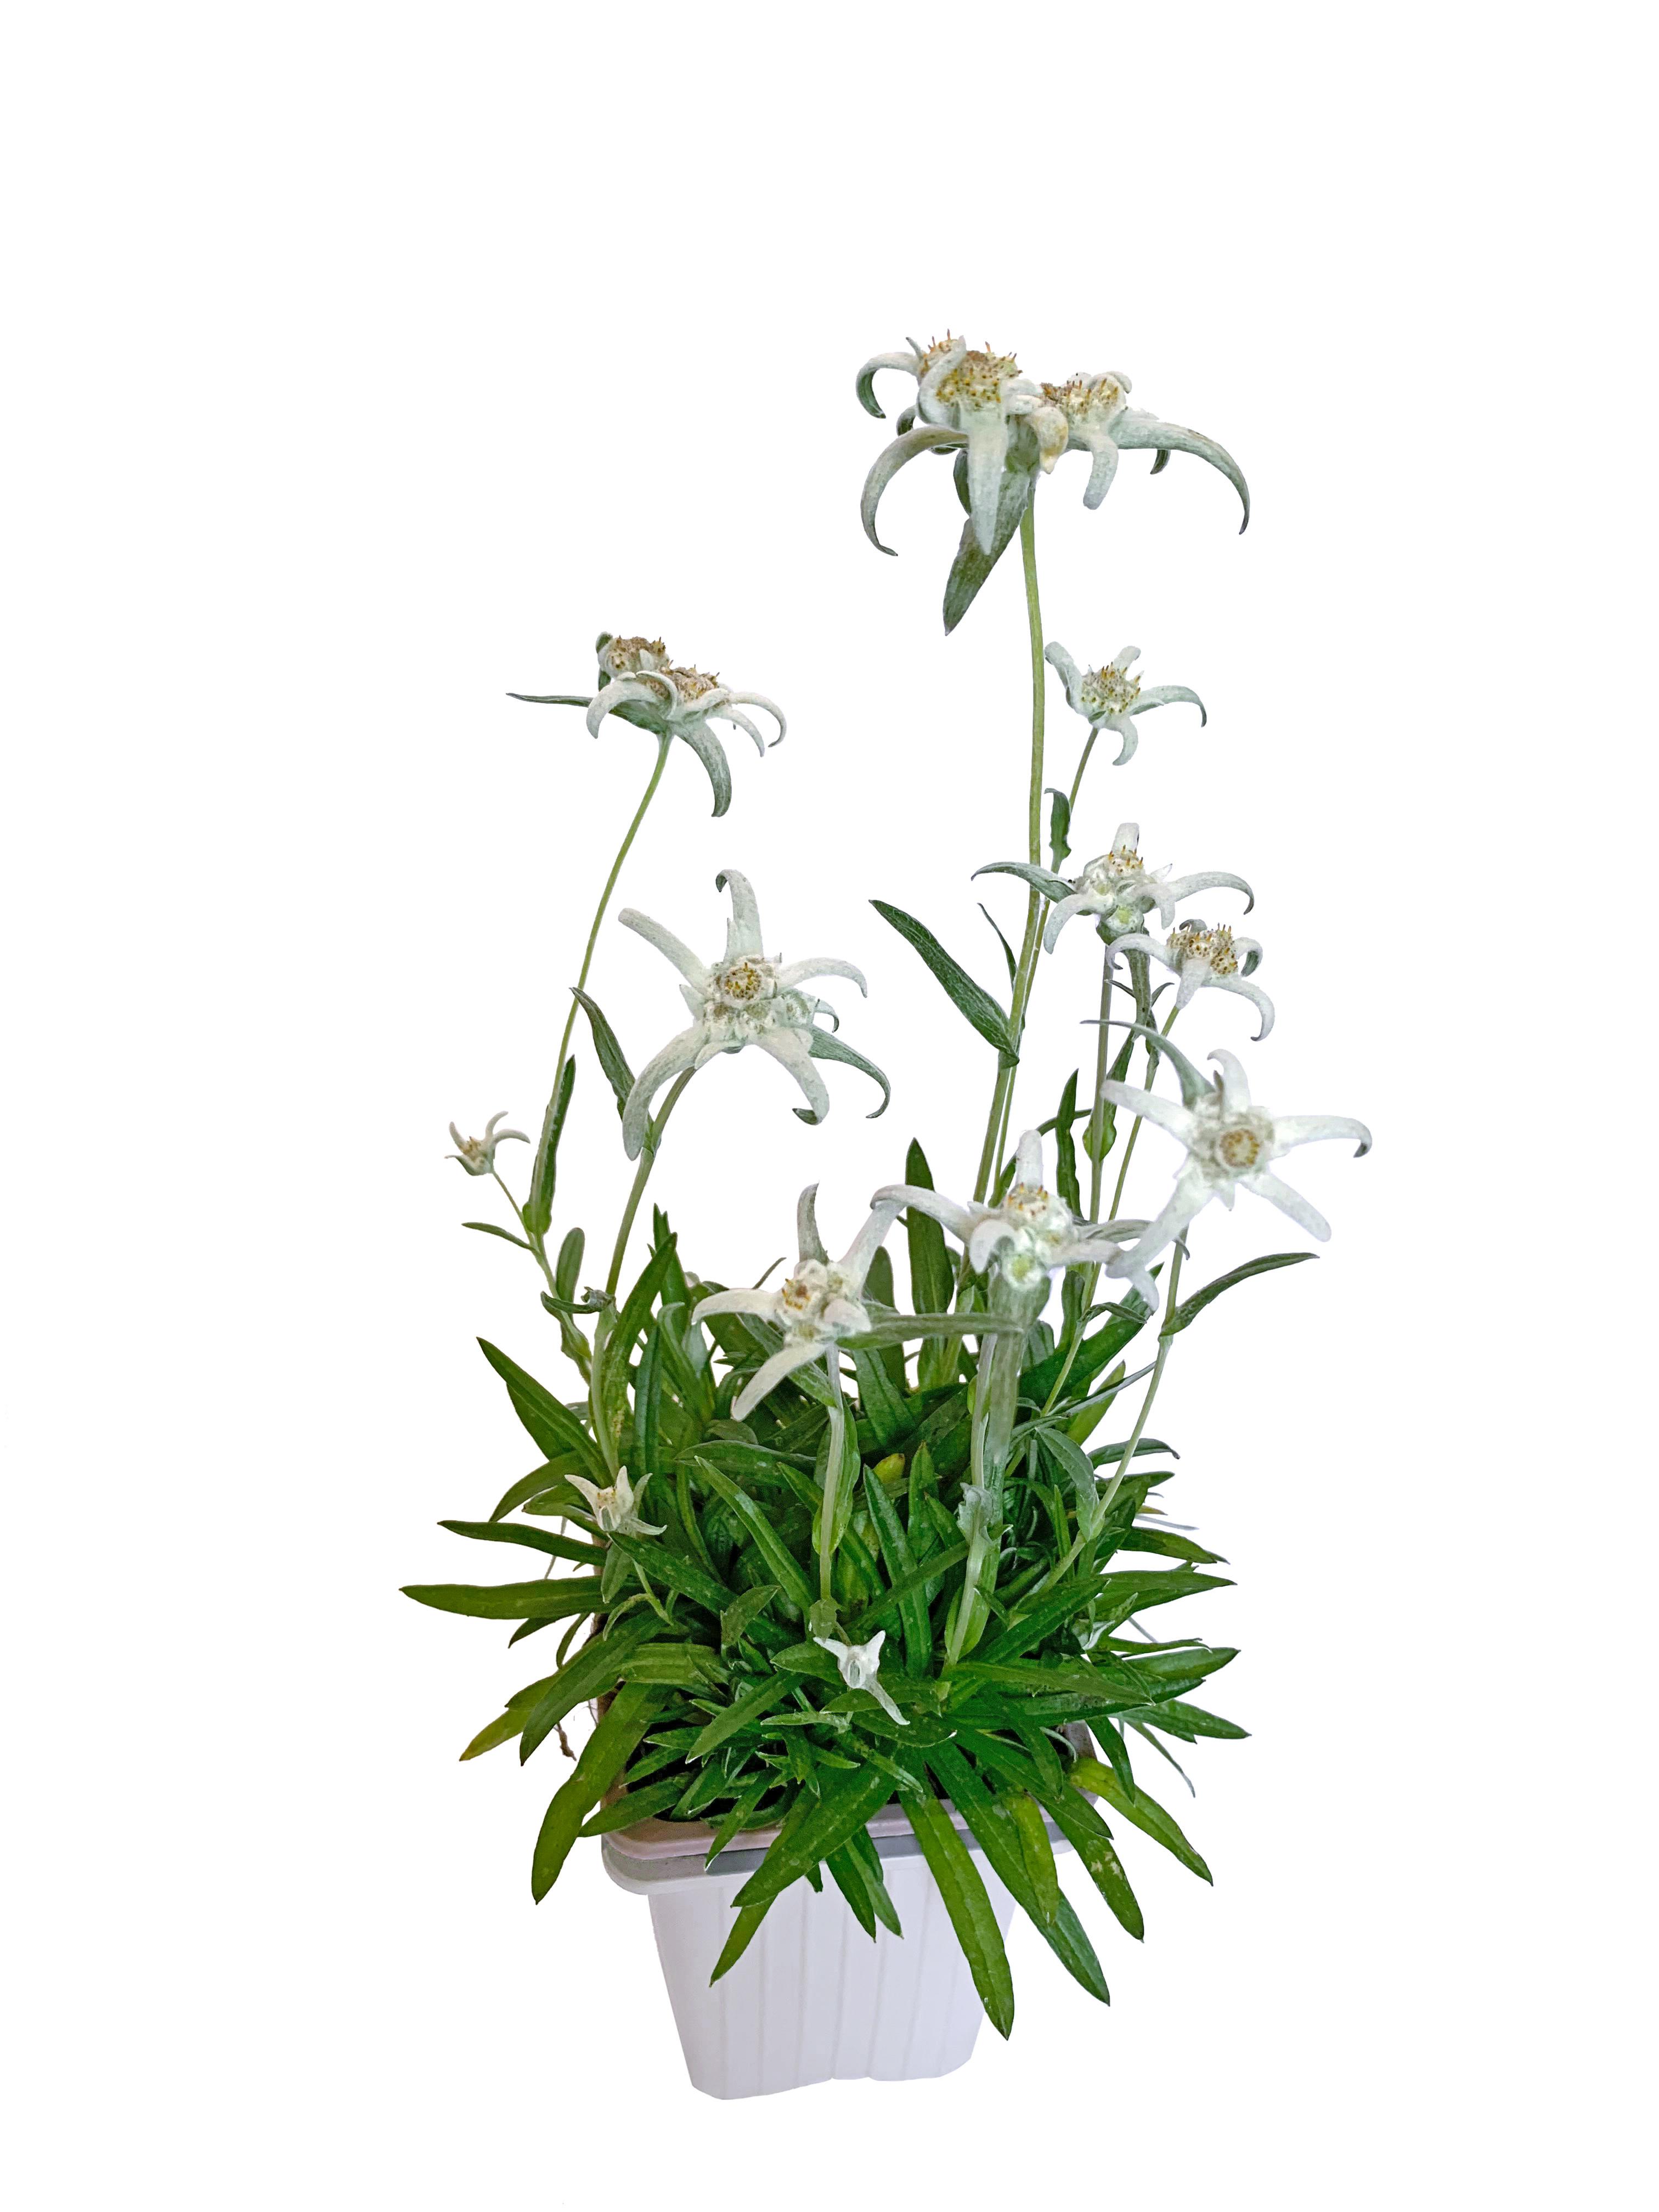 Edelweiß 'Höfats' (Leontopodium alpinum)